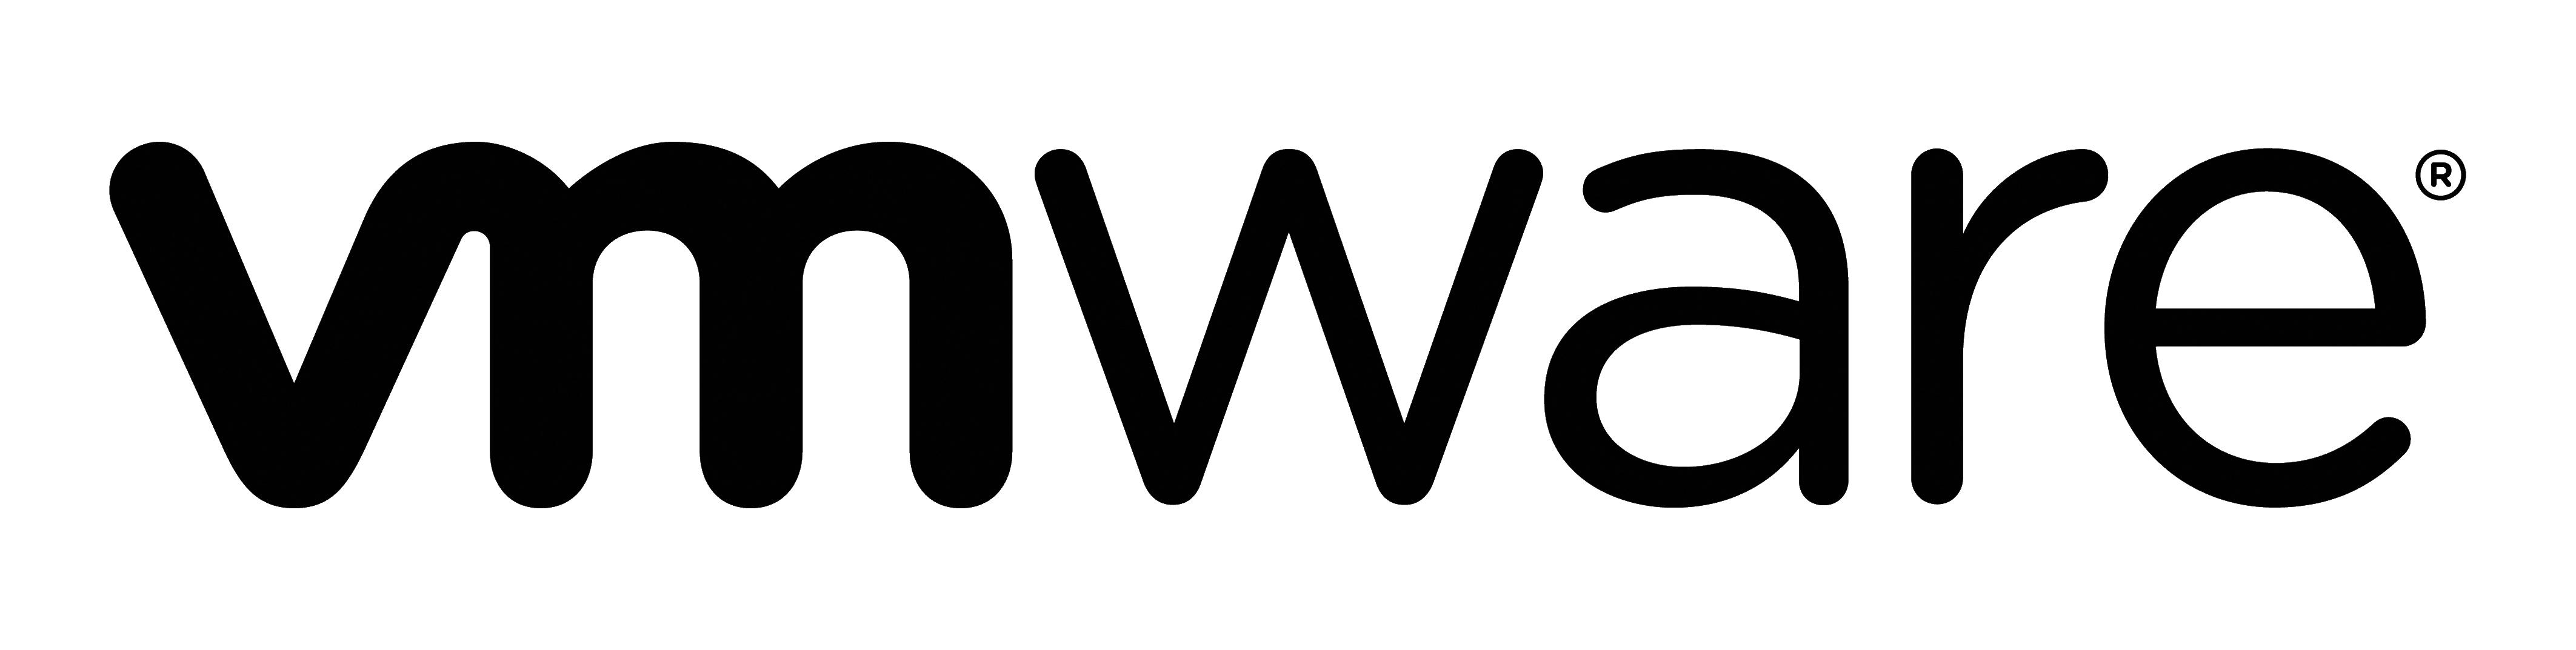 Black_Corp_Transparent_Logo.png